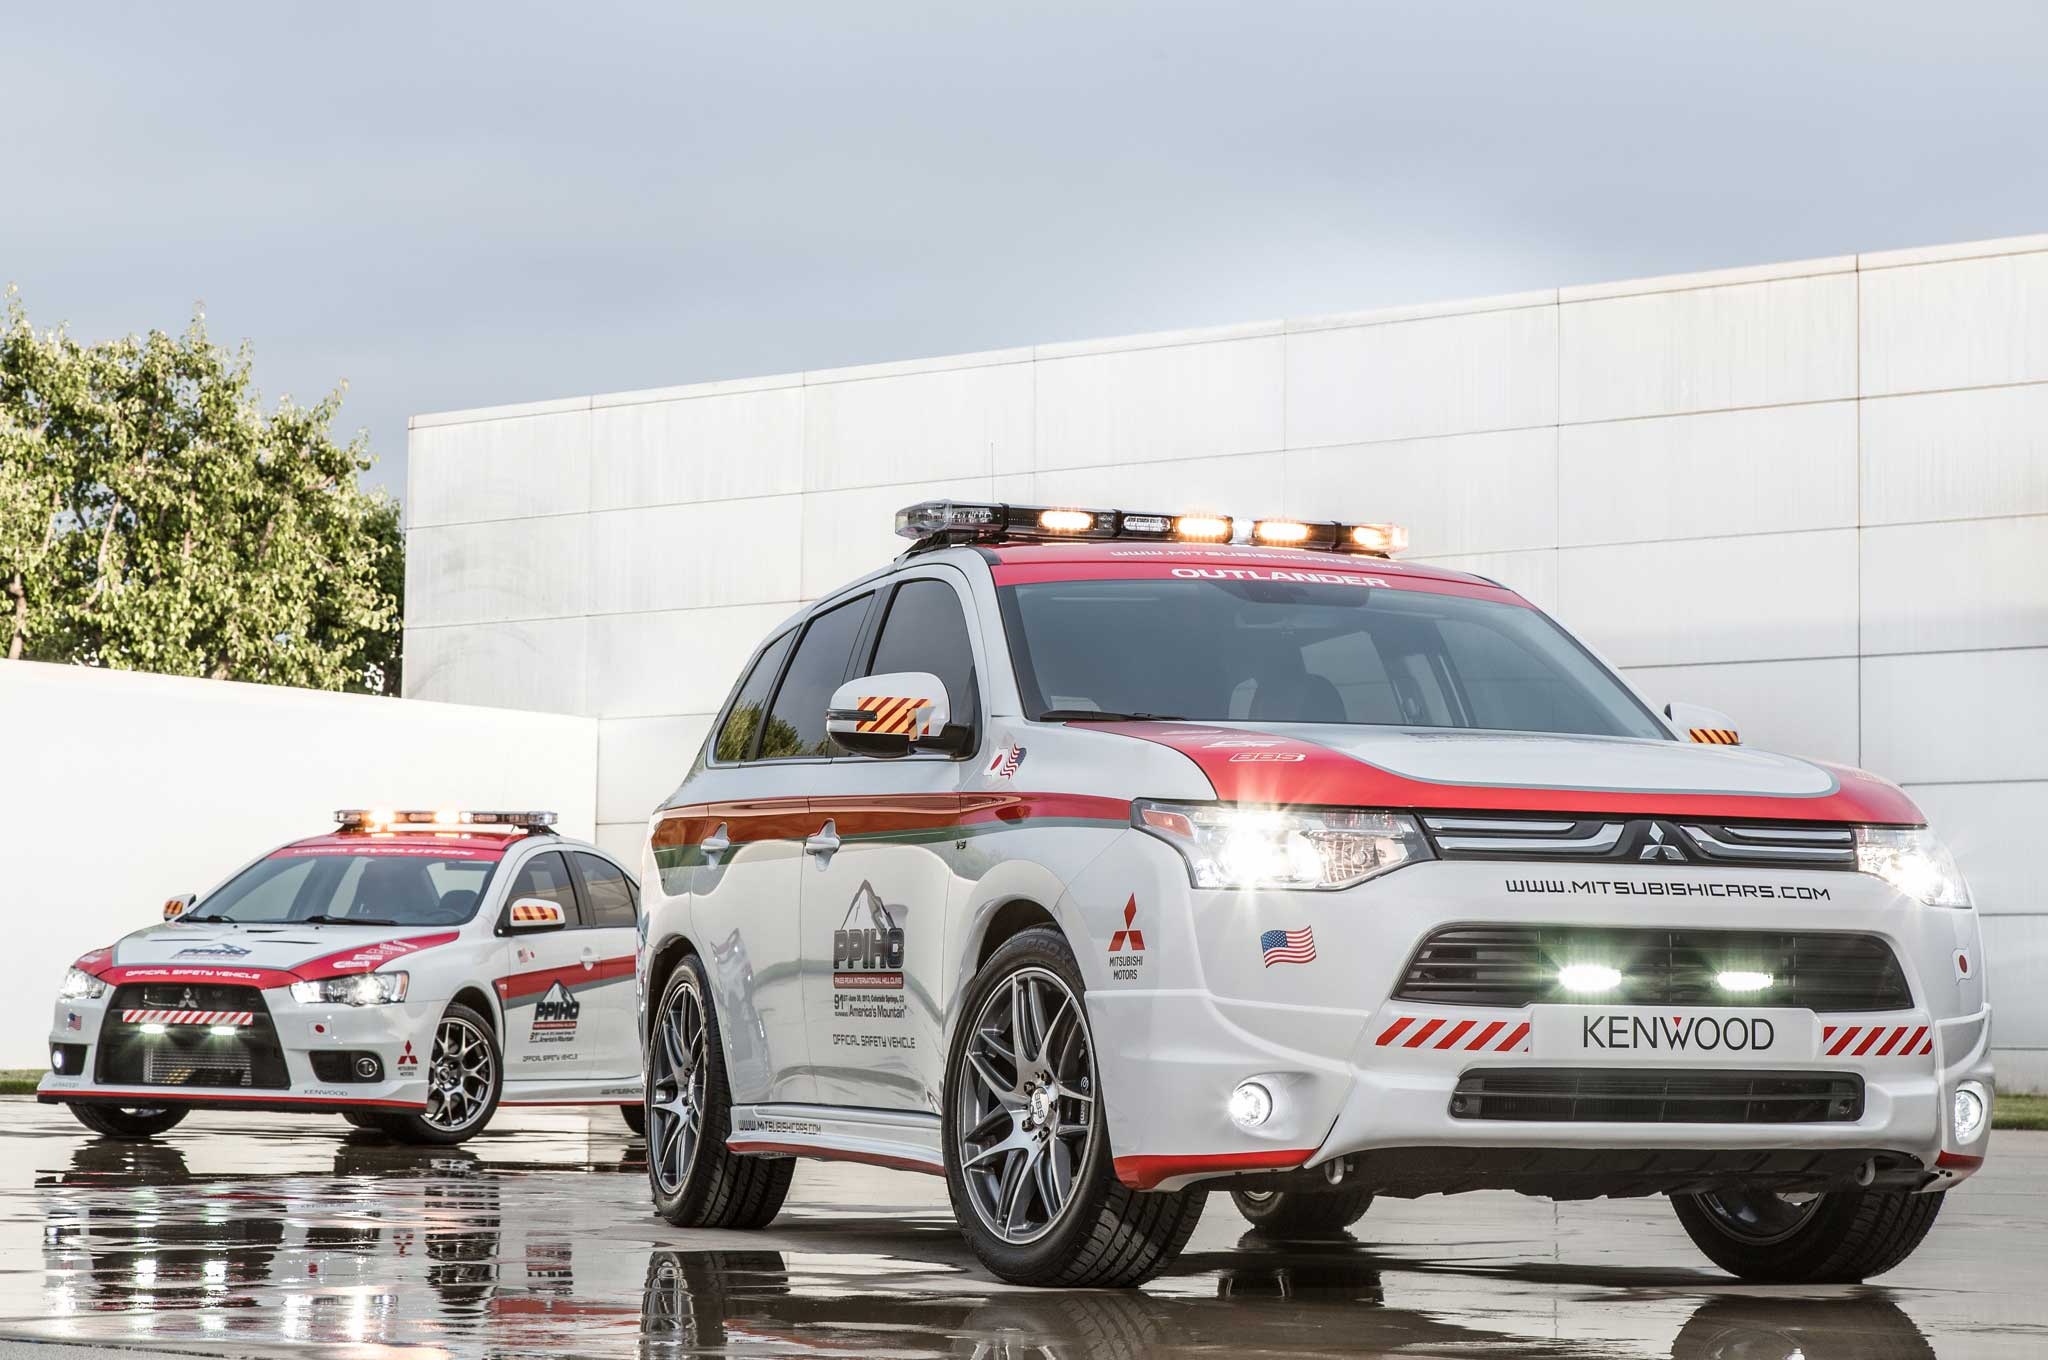 2014 Mitsubishi Outlander And 2013 Mitsubishi Lancer Evolution Safety Cars1